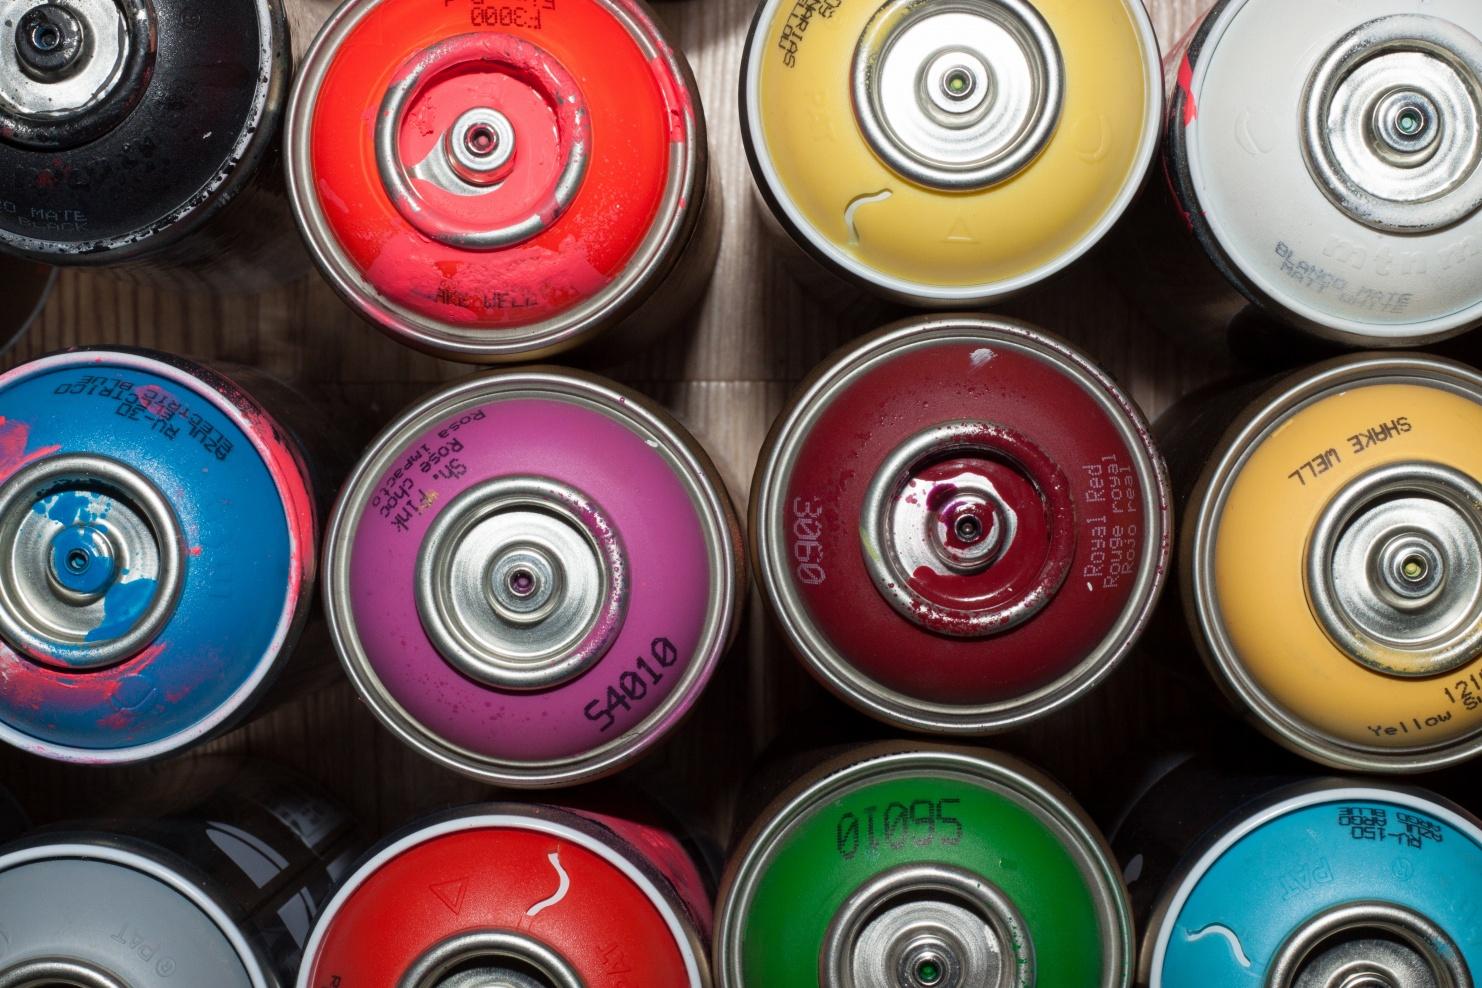 Sprühdosen in verschiedenen Farben © Photo by Ehimetalor Unuabona on Unsplash